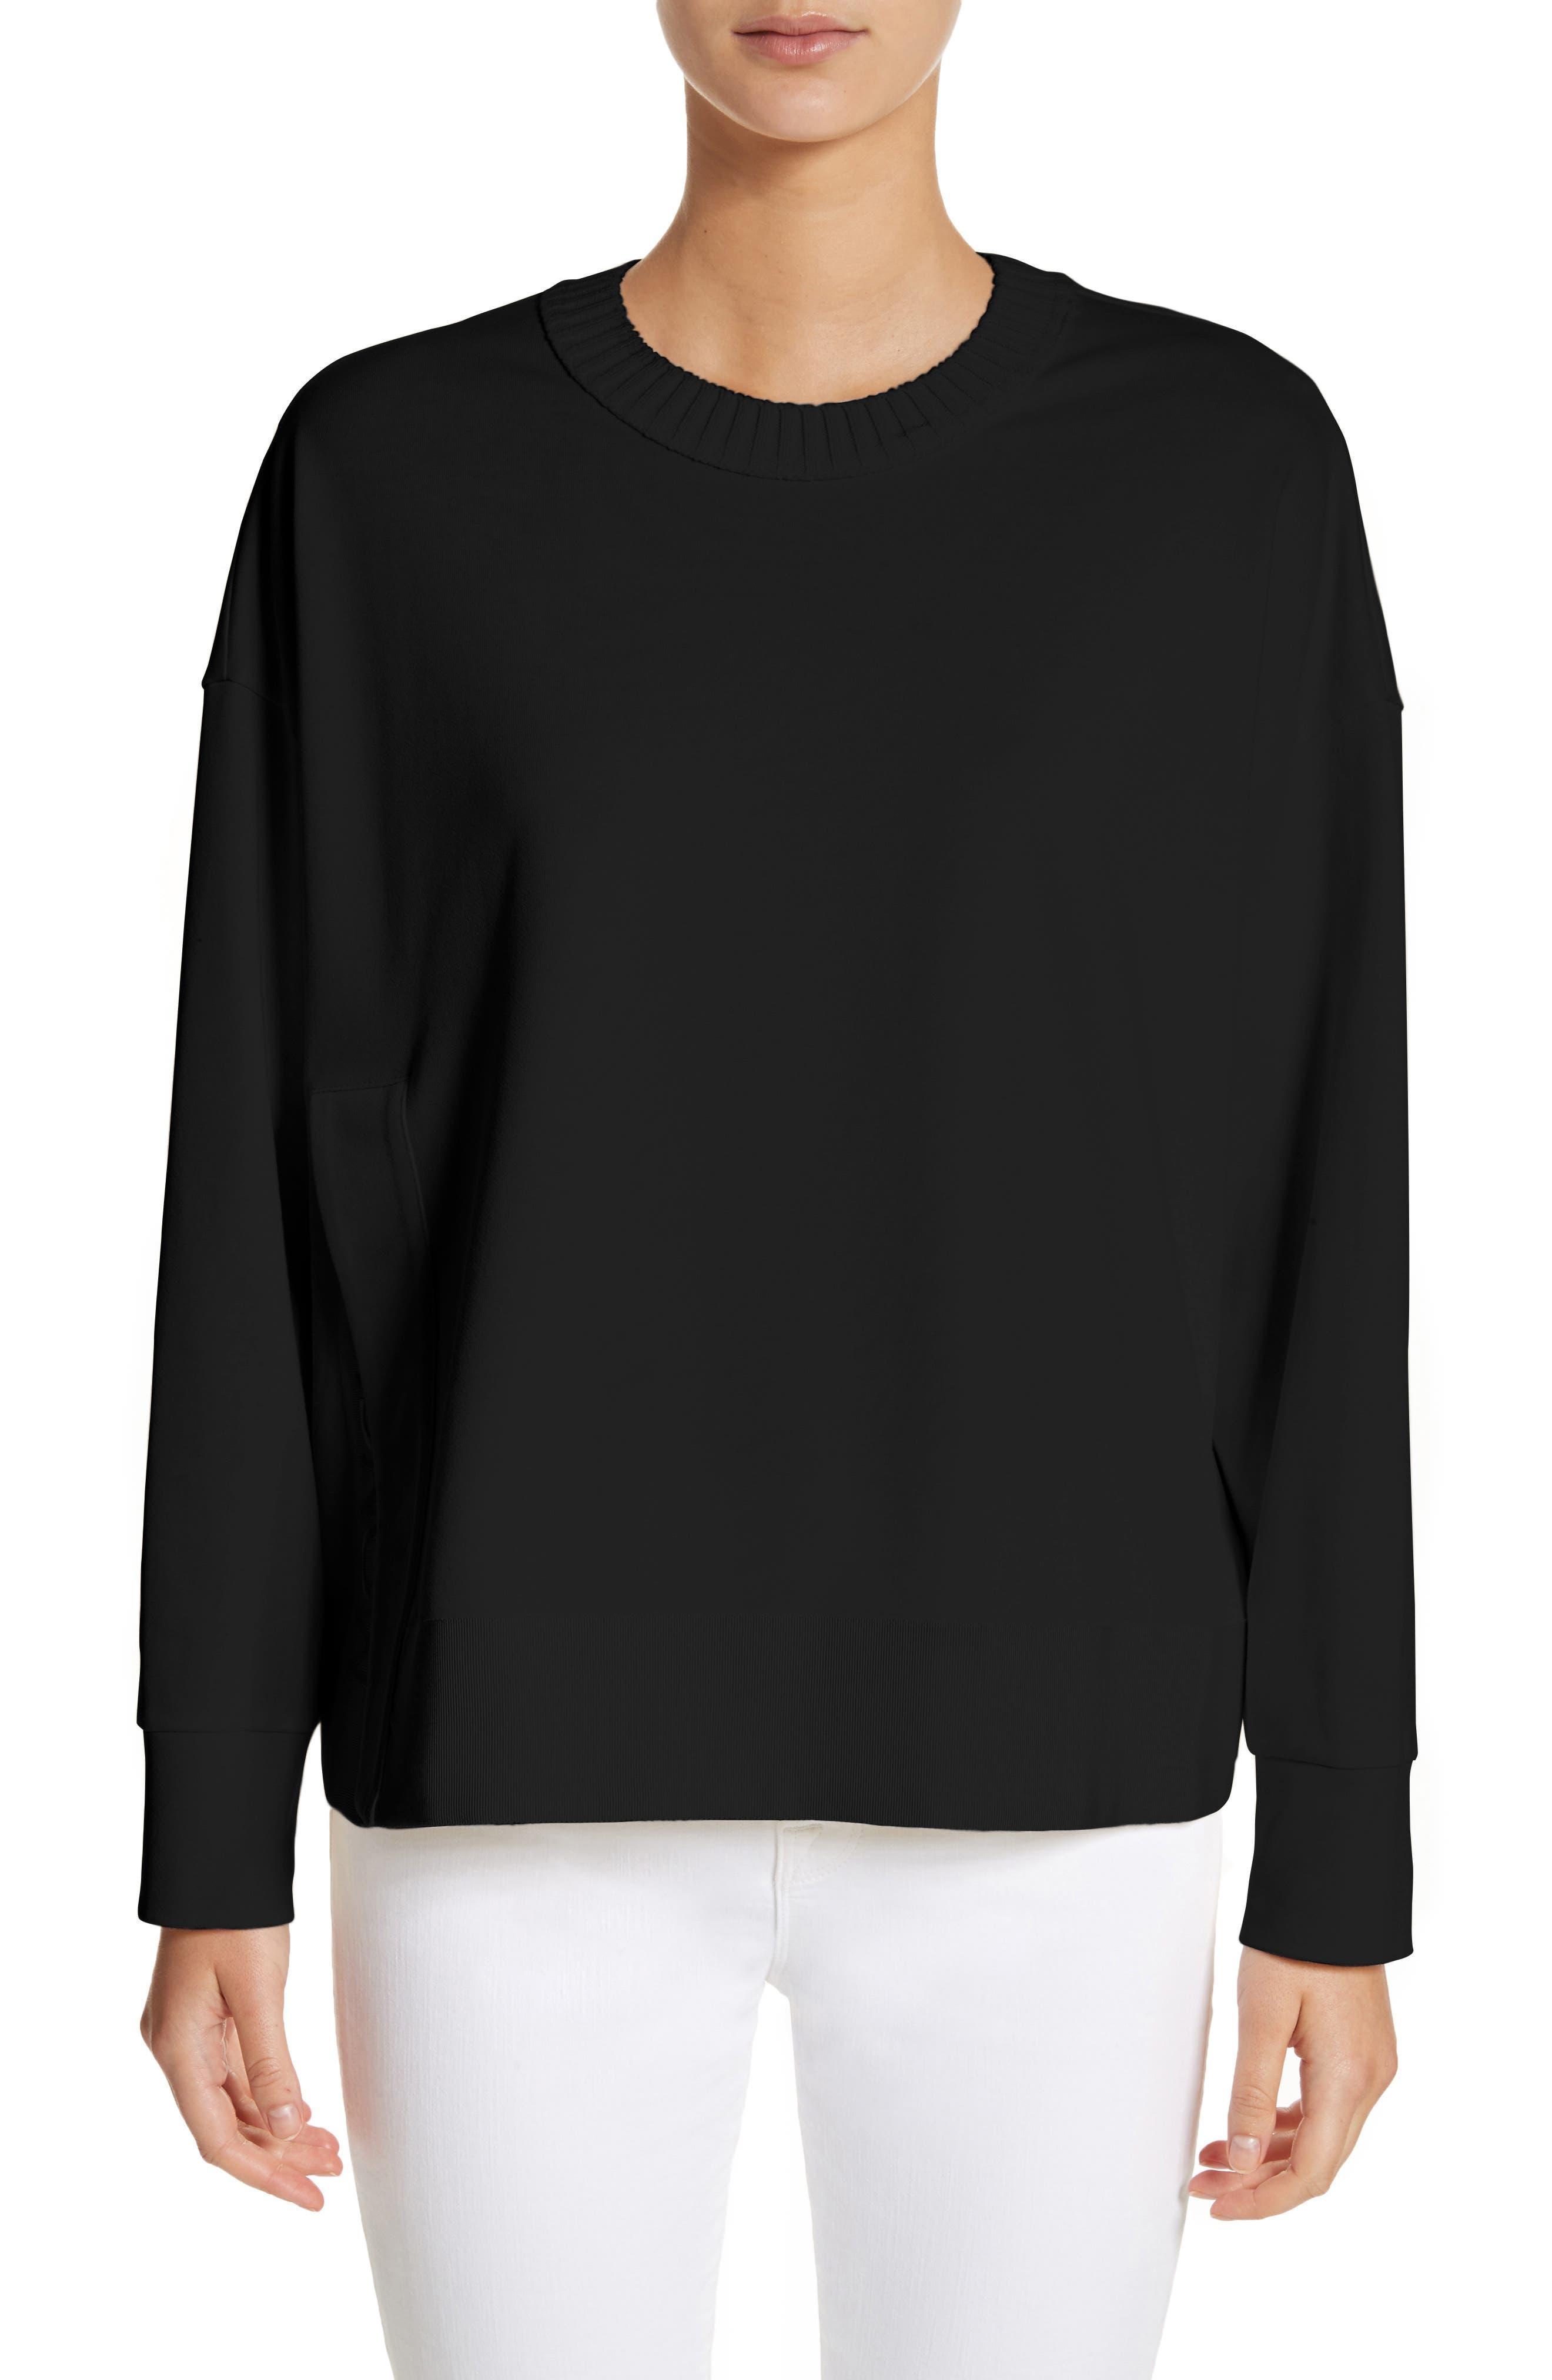 Cotton Sweatshirt,                             Main thumbnail 1, color,                             Black